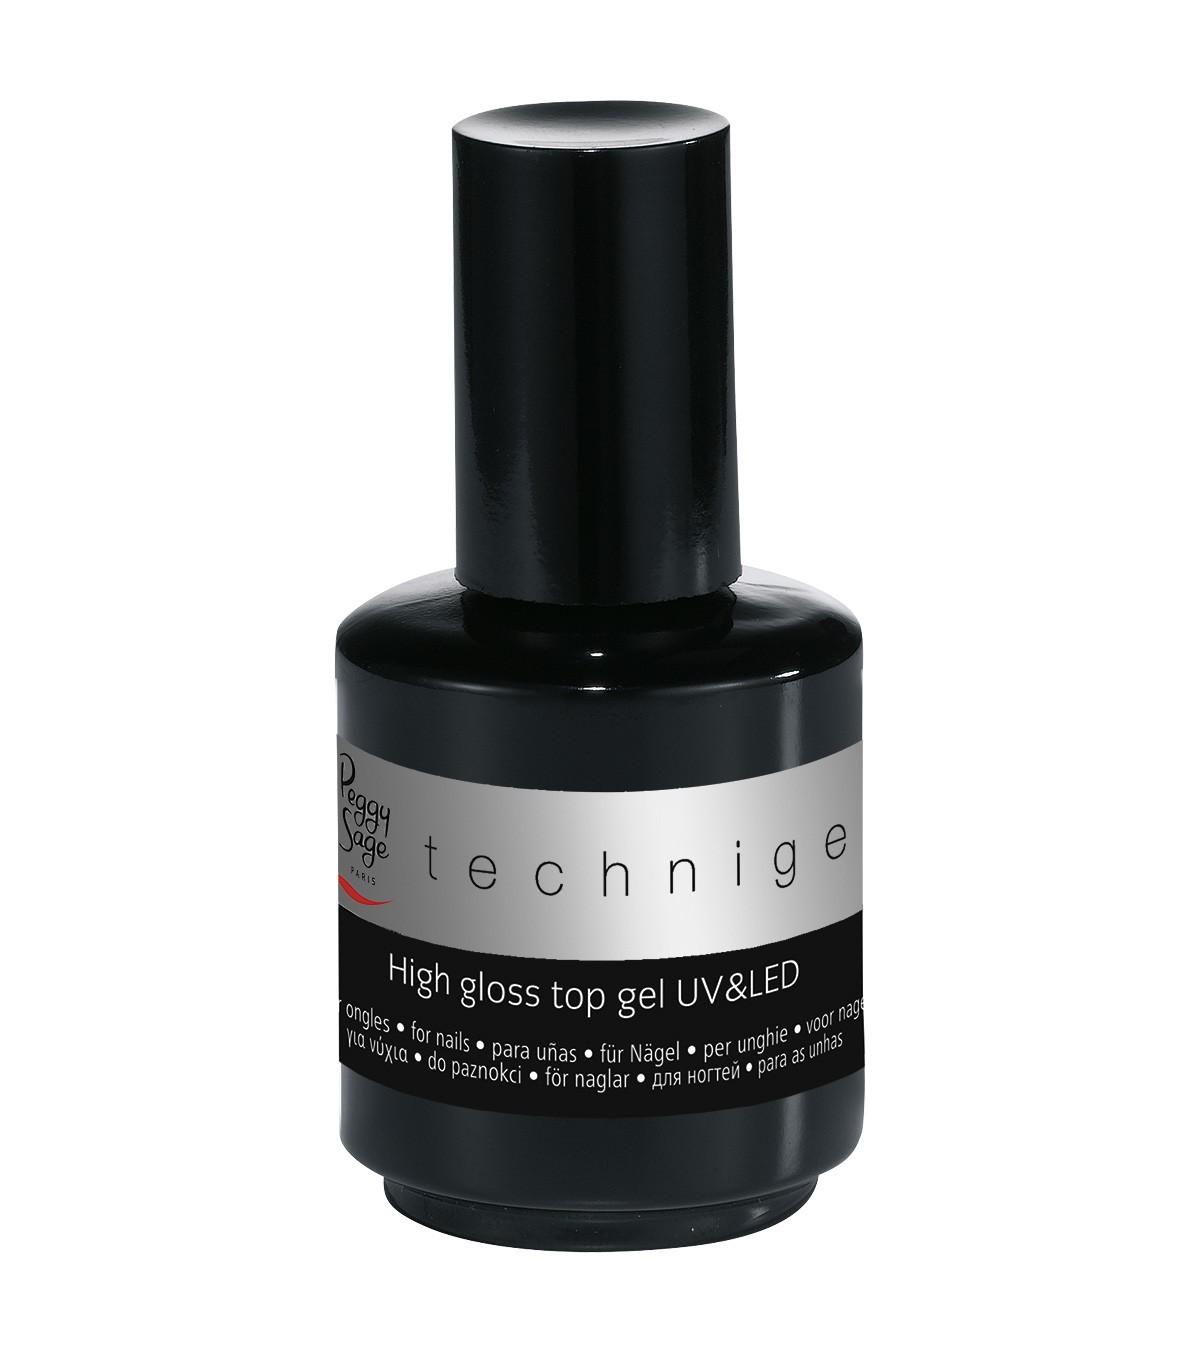 High gloss top gel UV et...